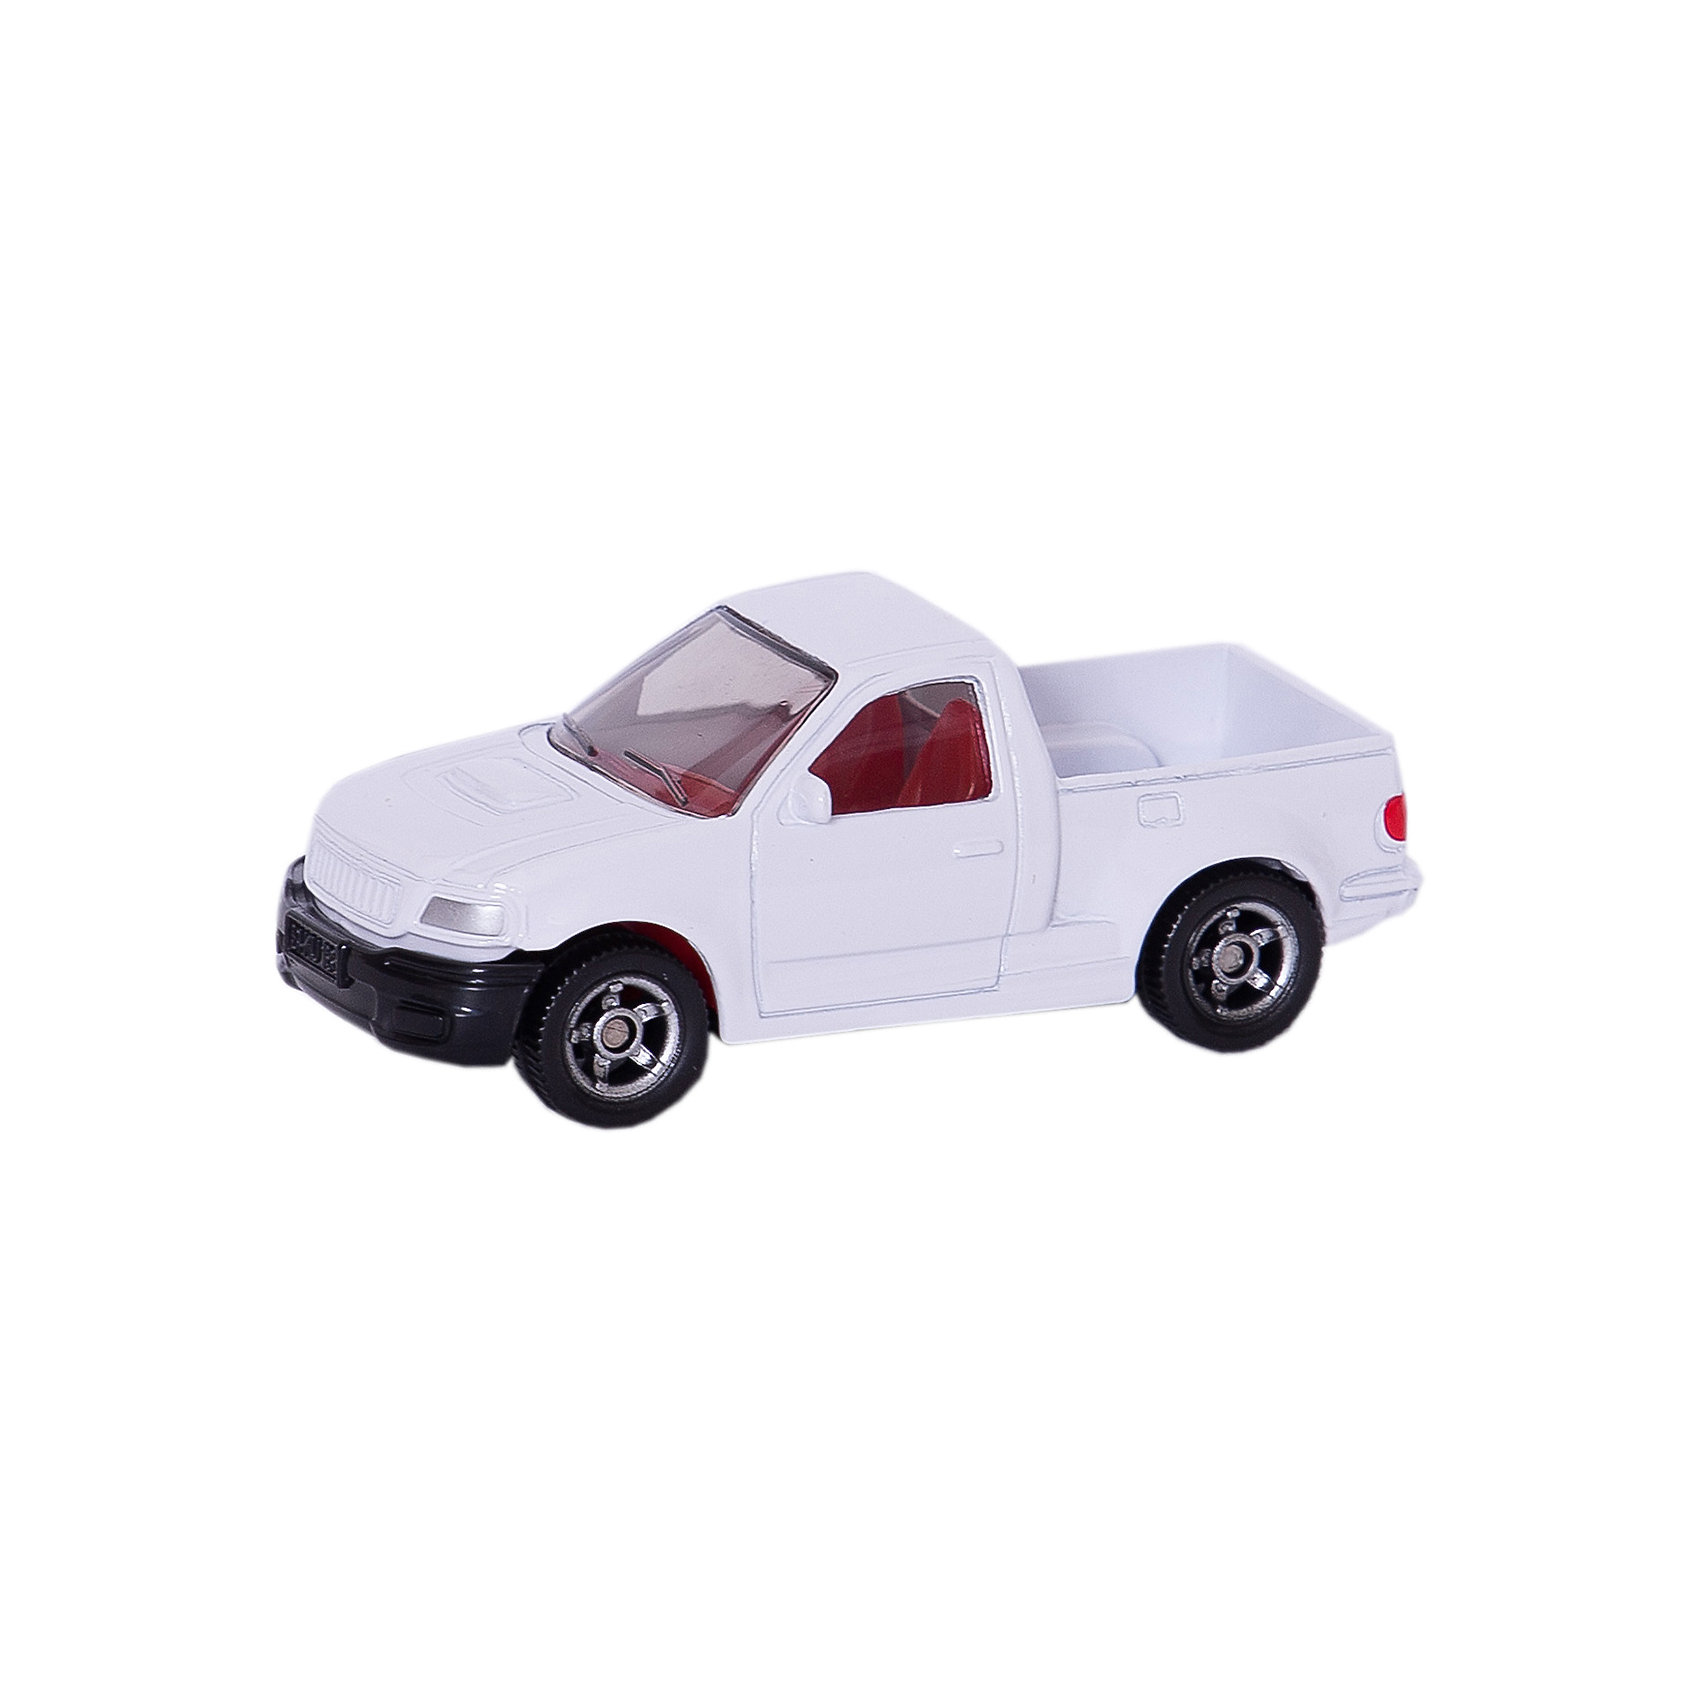 SIKU SIKU 0867 Пикап Ranger 1 1:55 siku siku 1007 bmw 645i cabrio